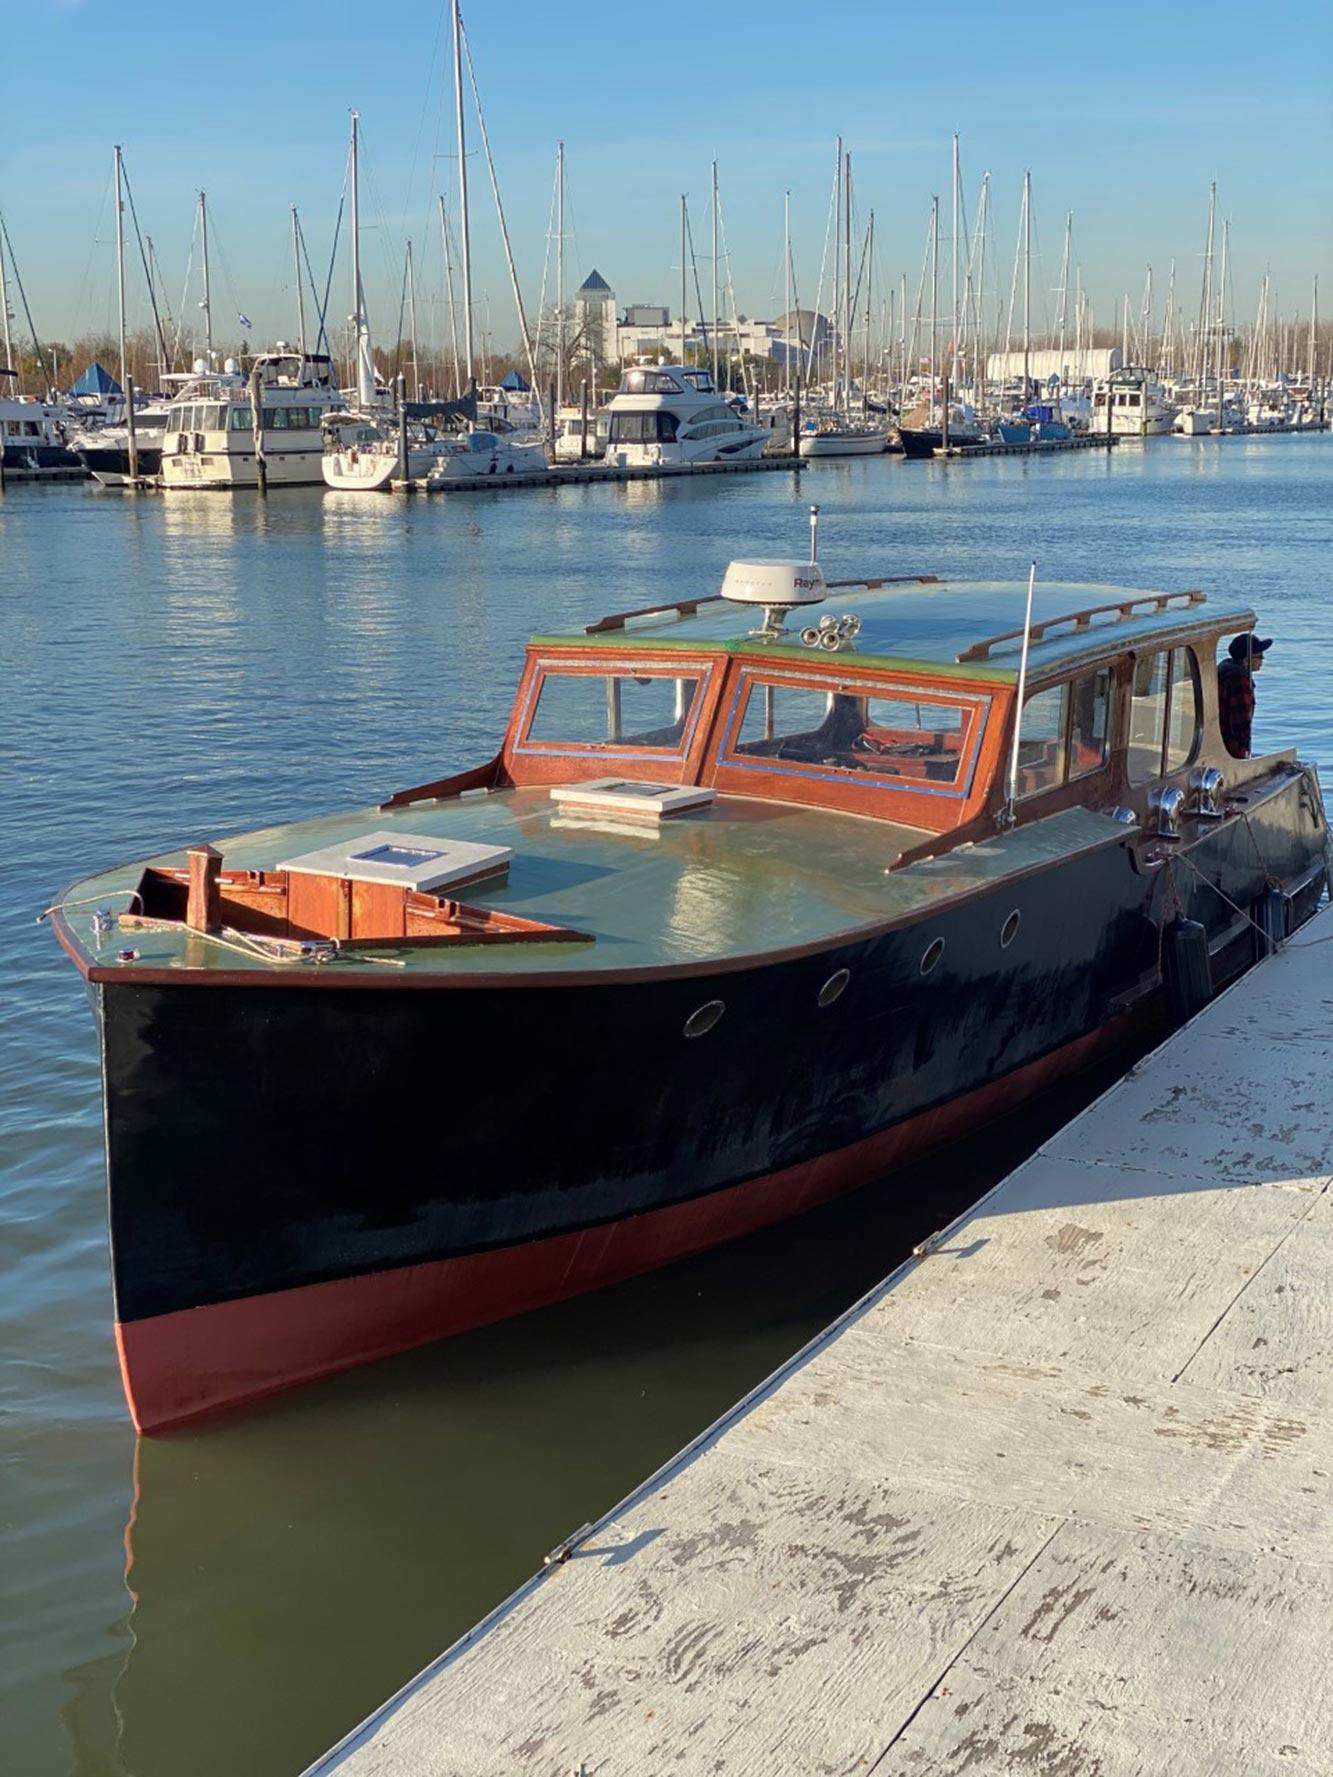 Matthew Rhys is restoring a Hemingway-era boat